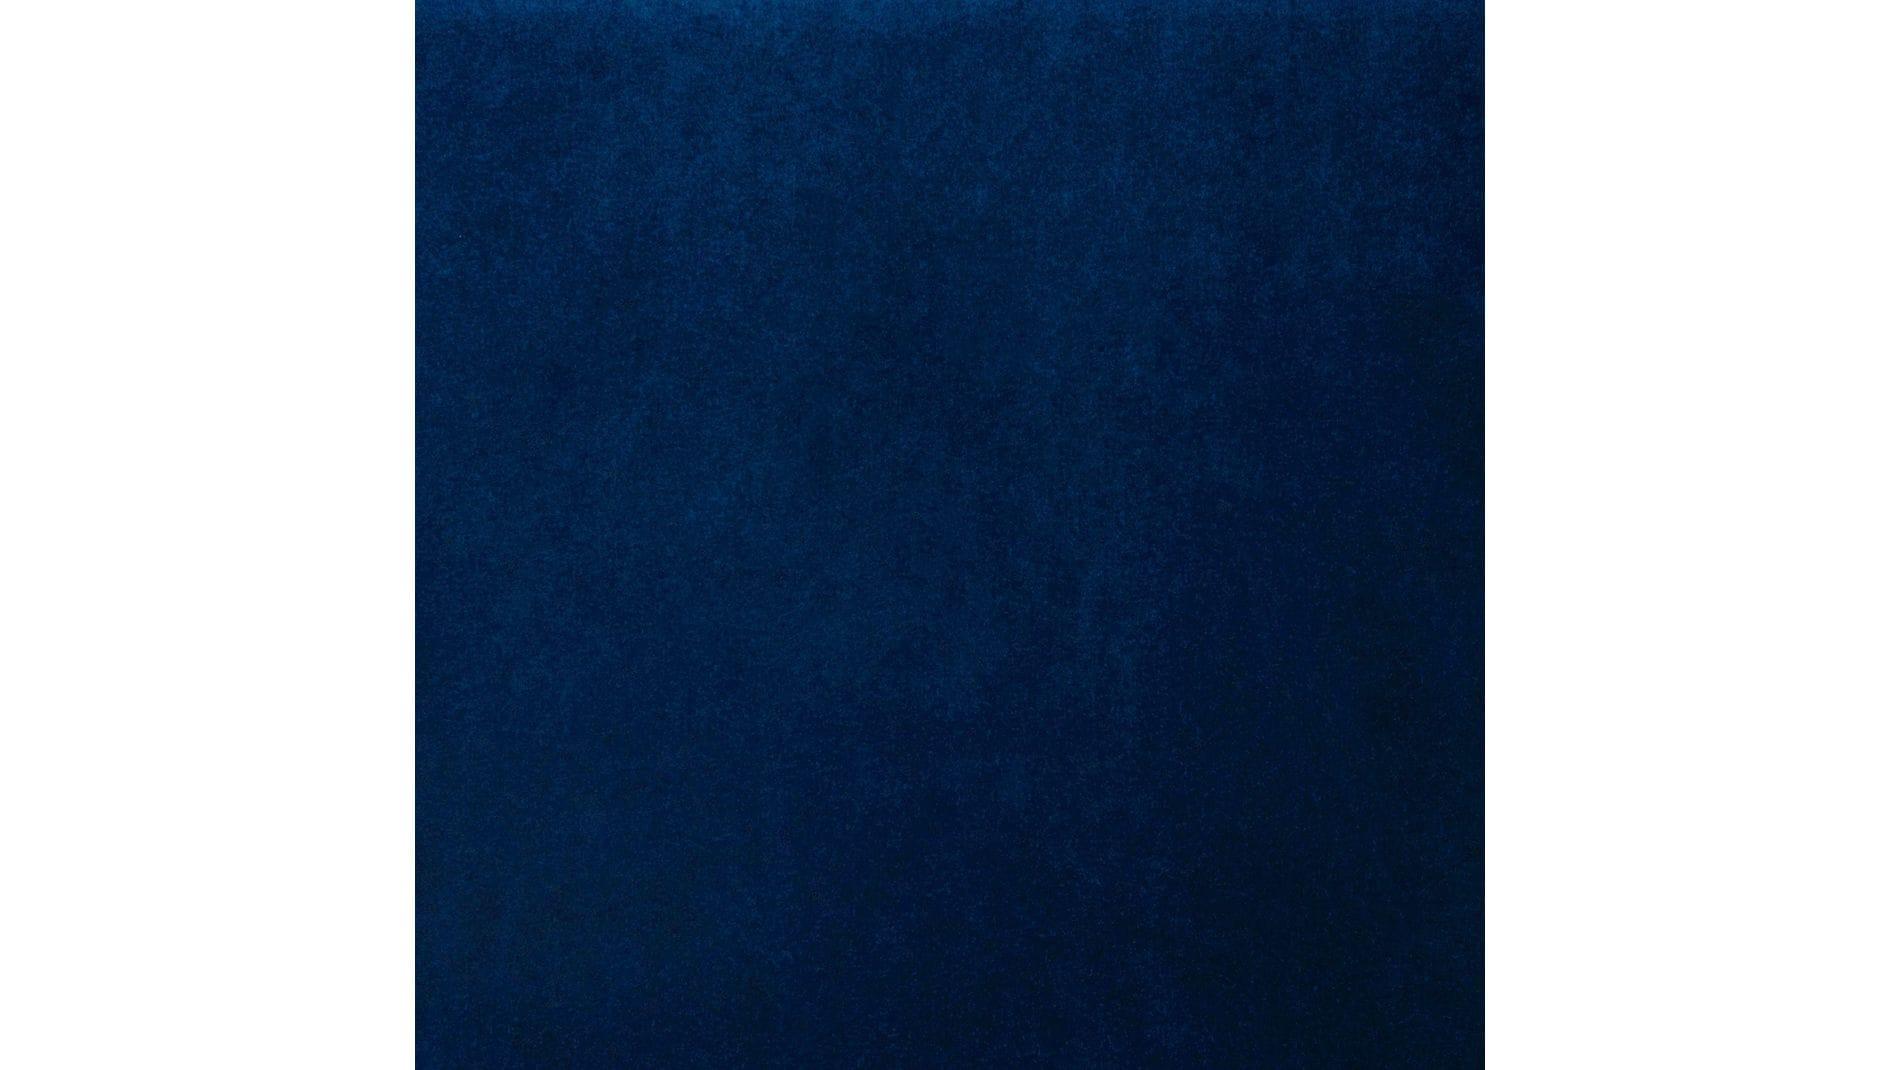 Диван La Rosa трехместный Синий Велюр Р